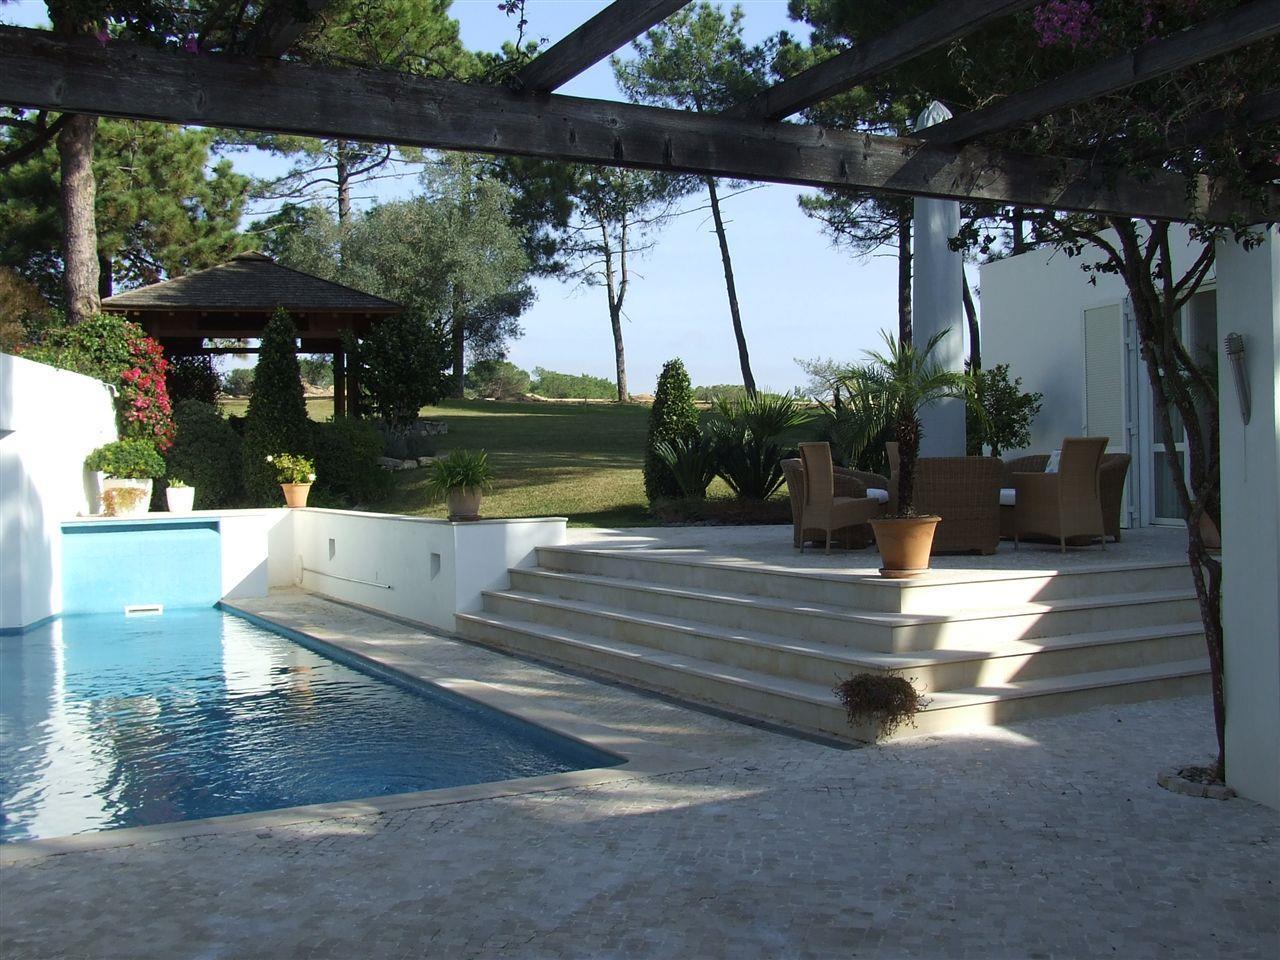 Moradia para Venda às Detached house, 6 bedrooms, for Sale Loule, Algarve Portugal